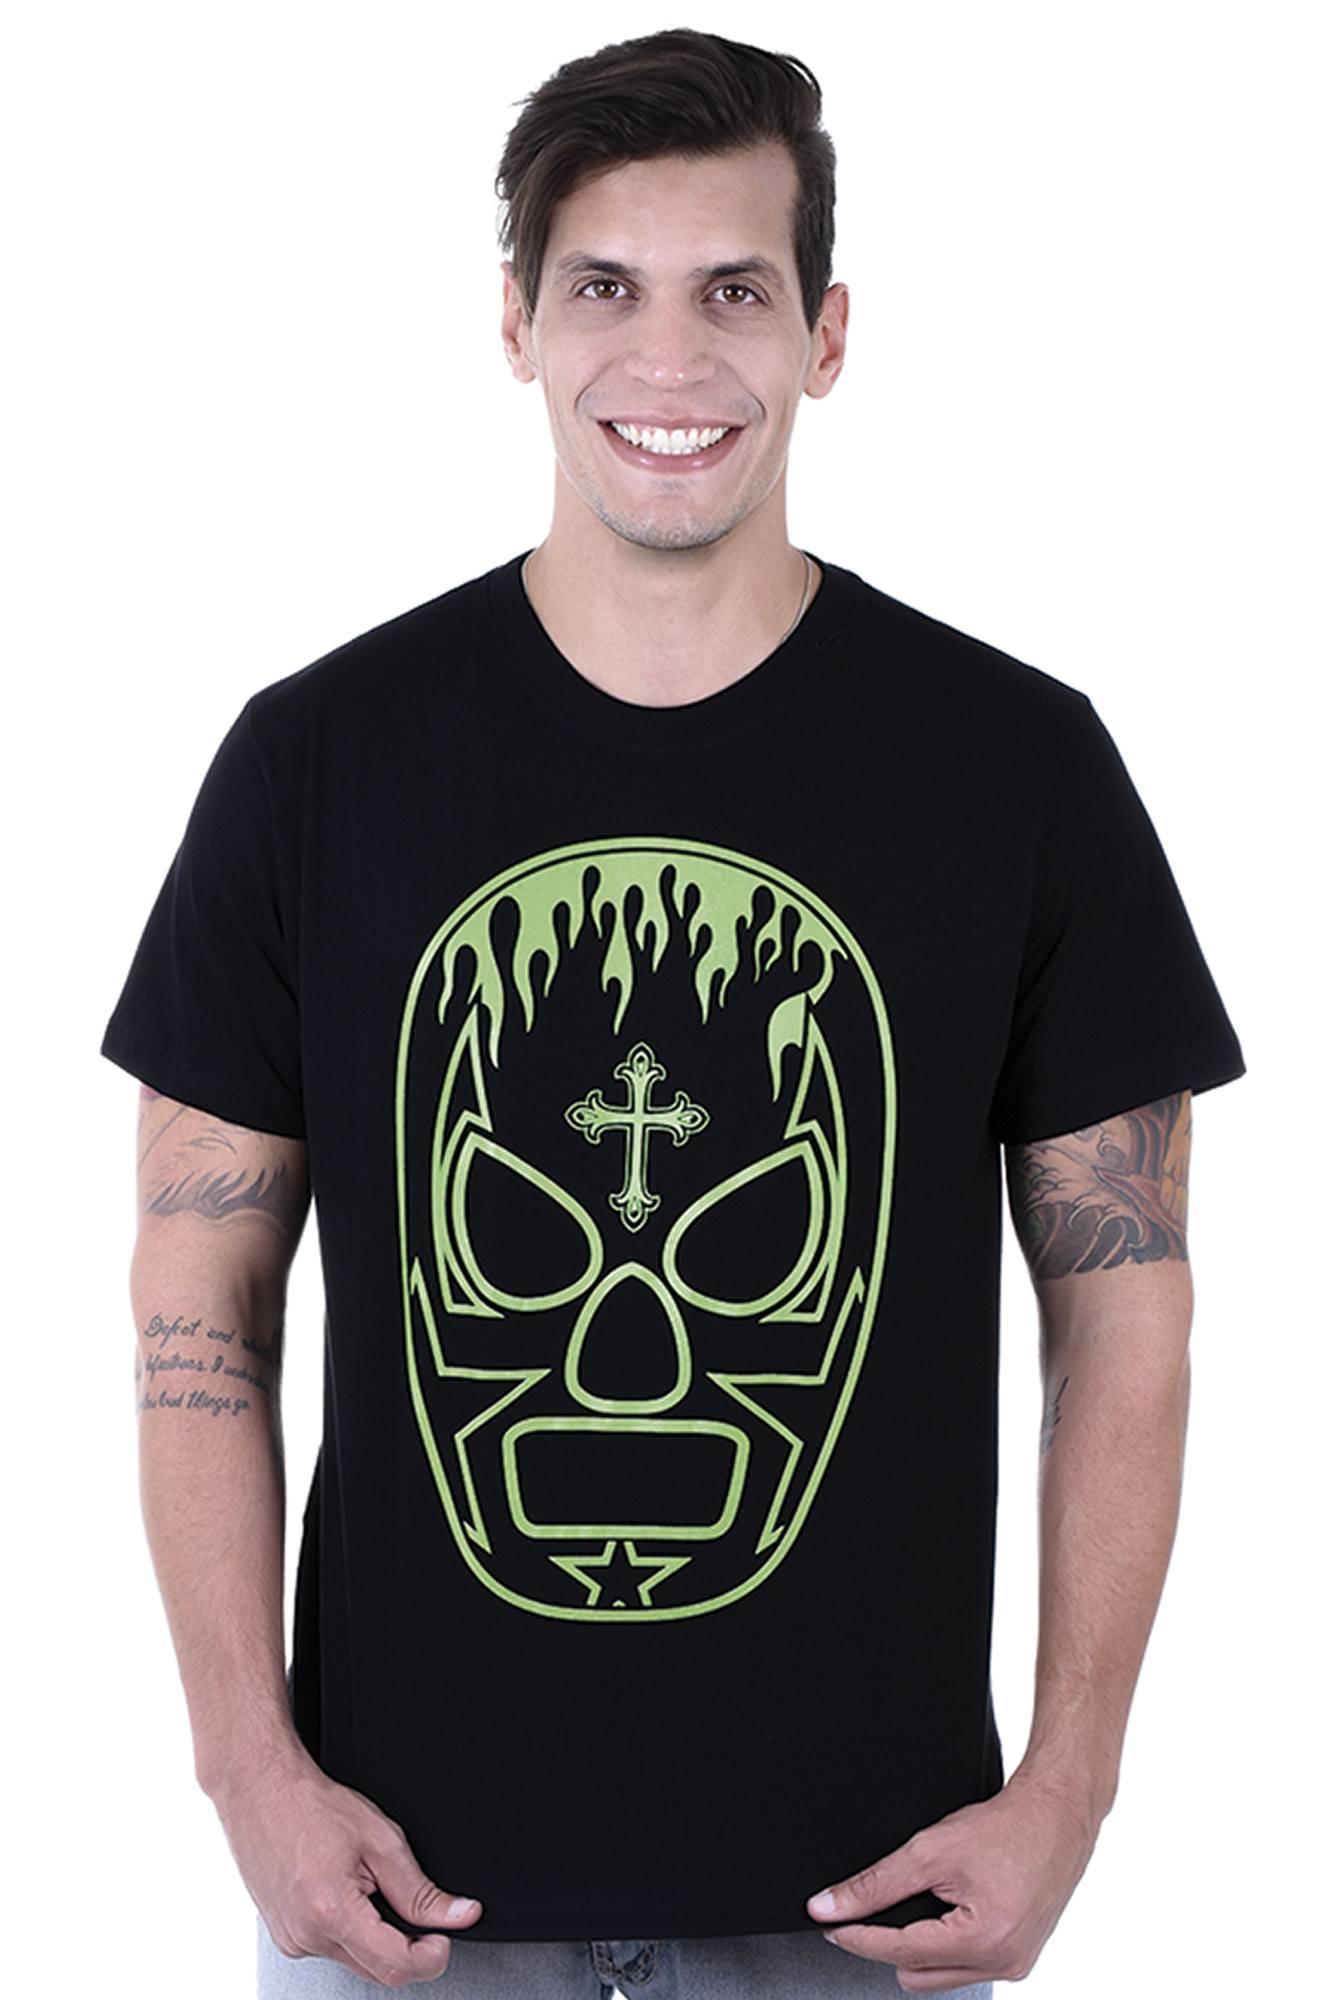 Camiseta  Masculina  Estampada Lucha Libre Preto Hardivision